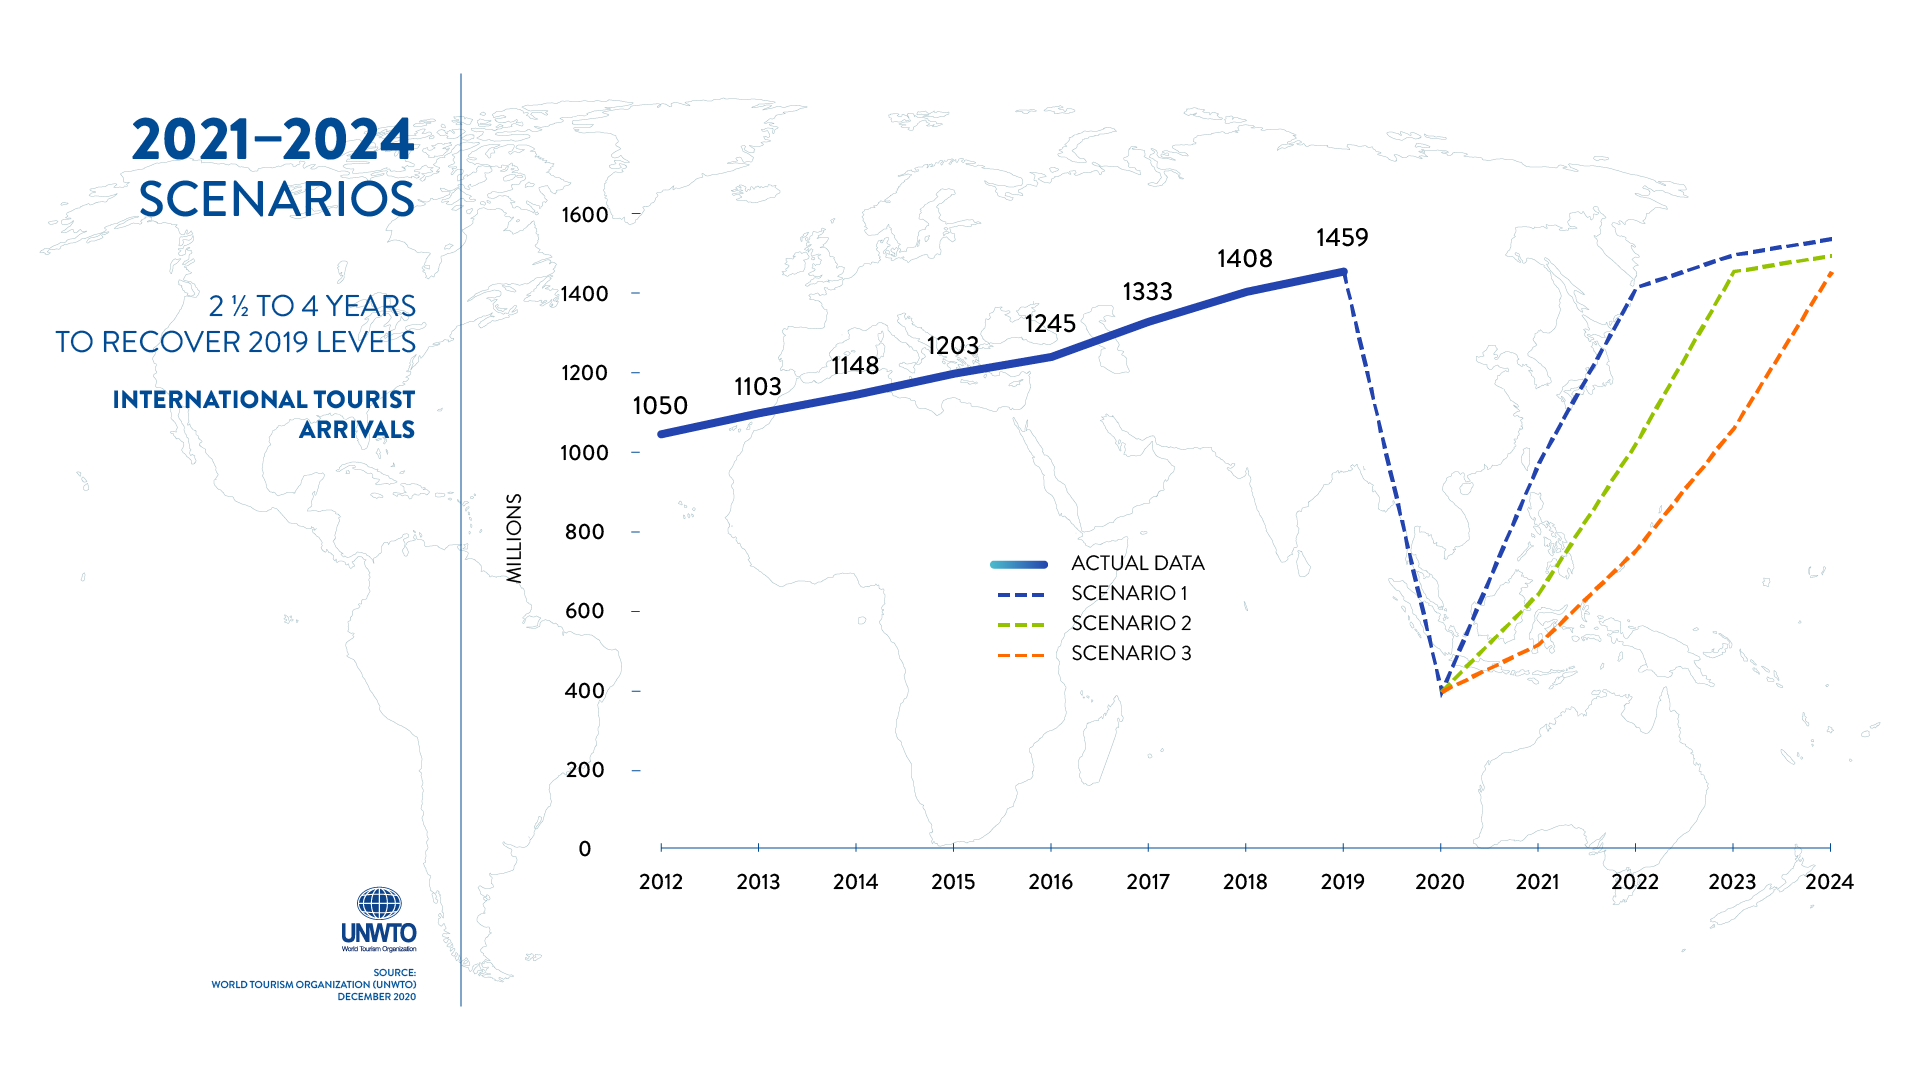 International tourist arrivals, 2000-2019 and scenarios for 2020 (% change)